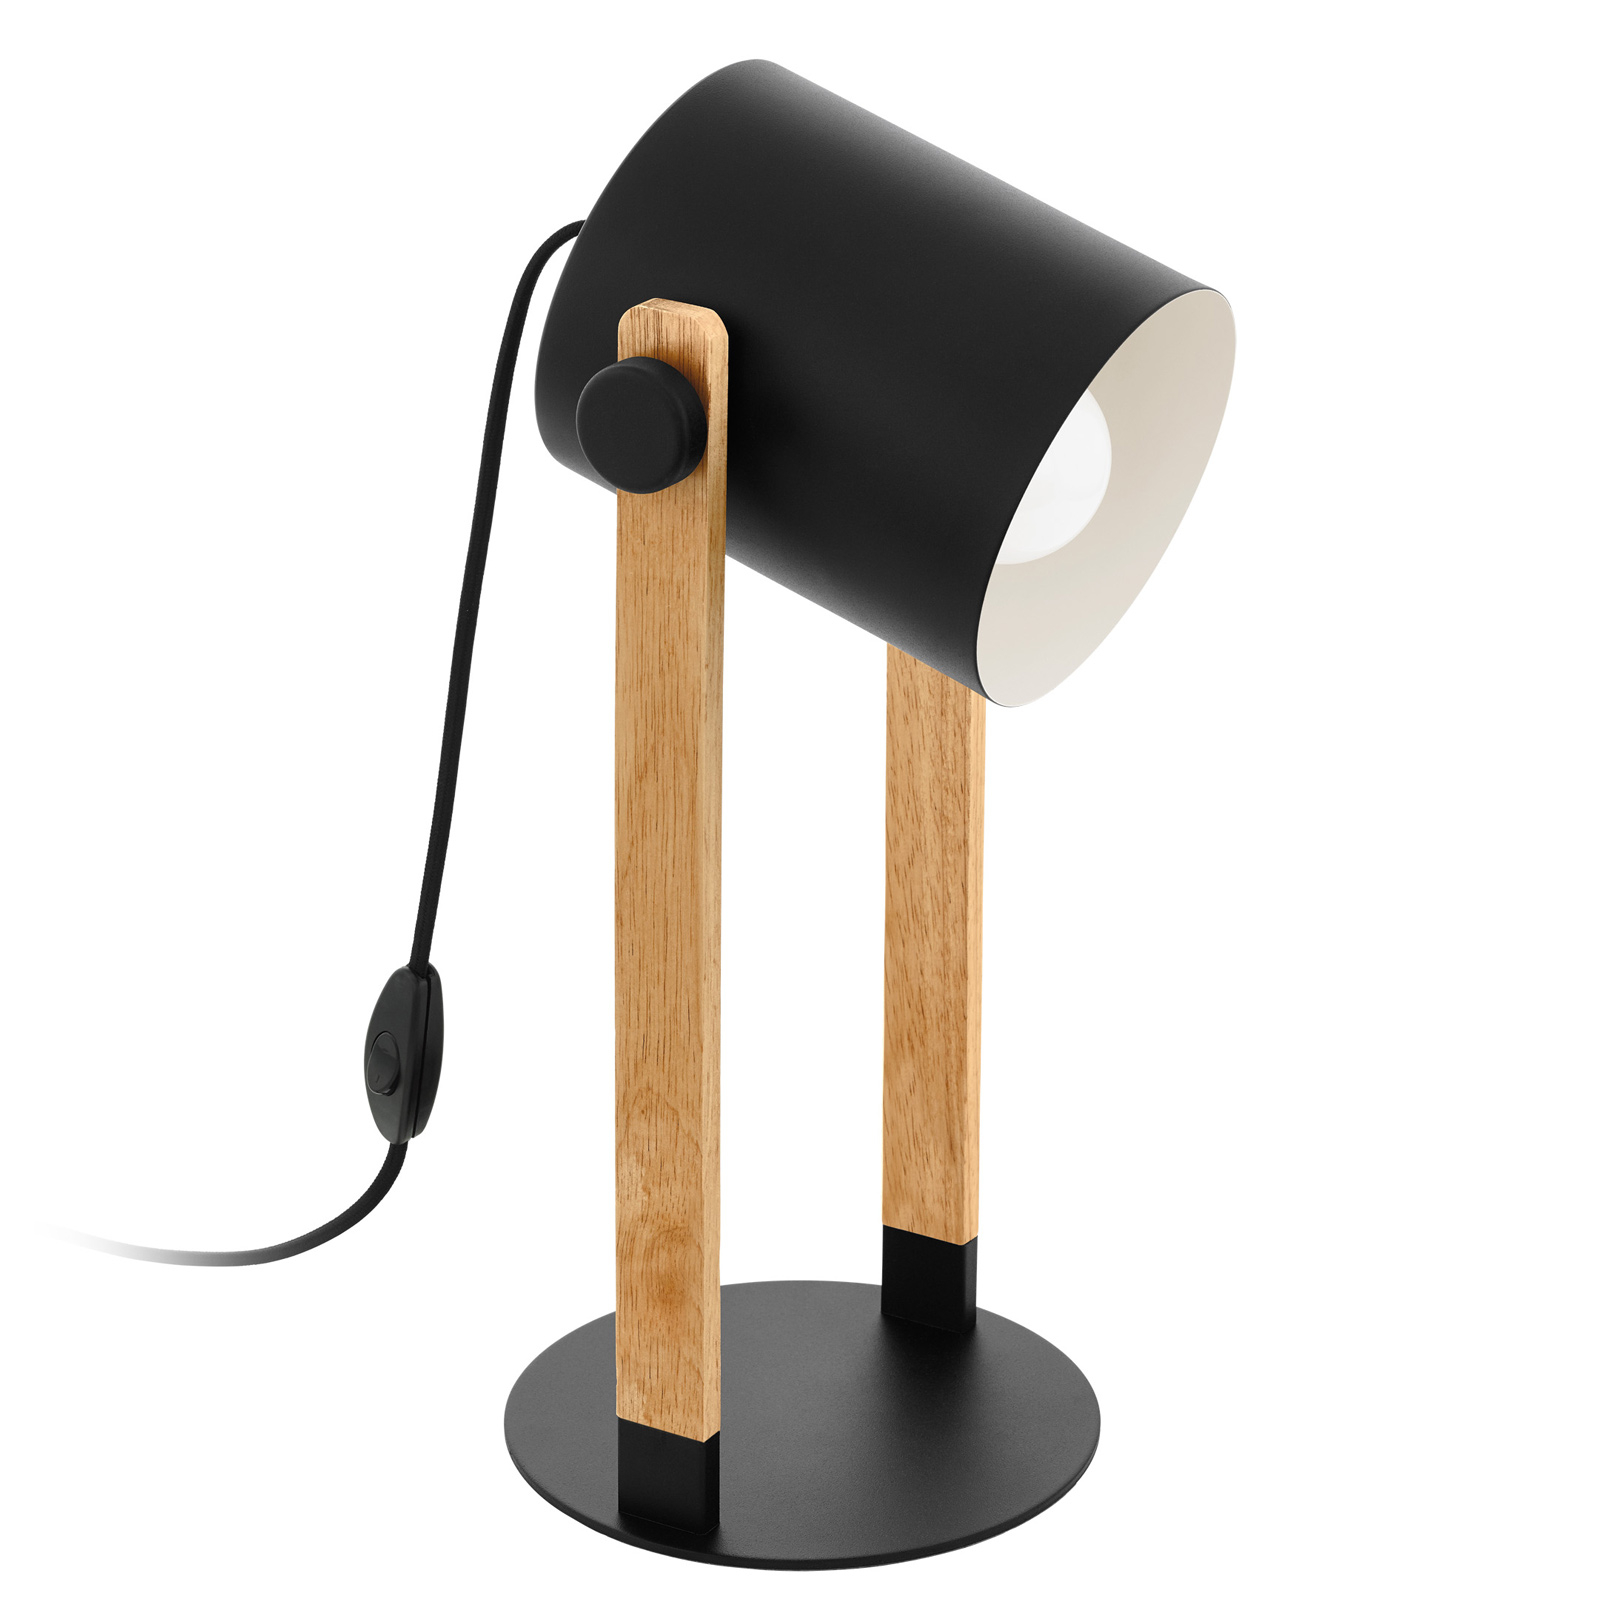 Tafellamp Hornwood met houtdetails